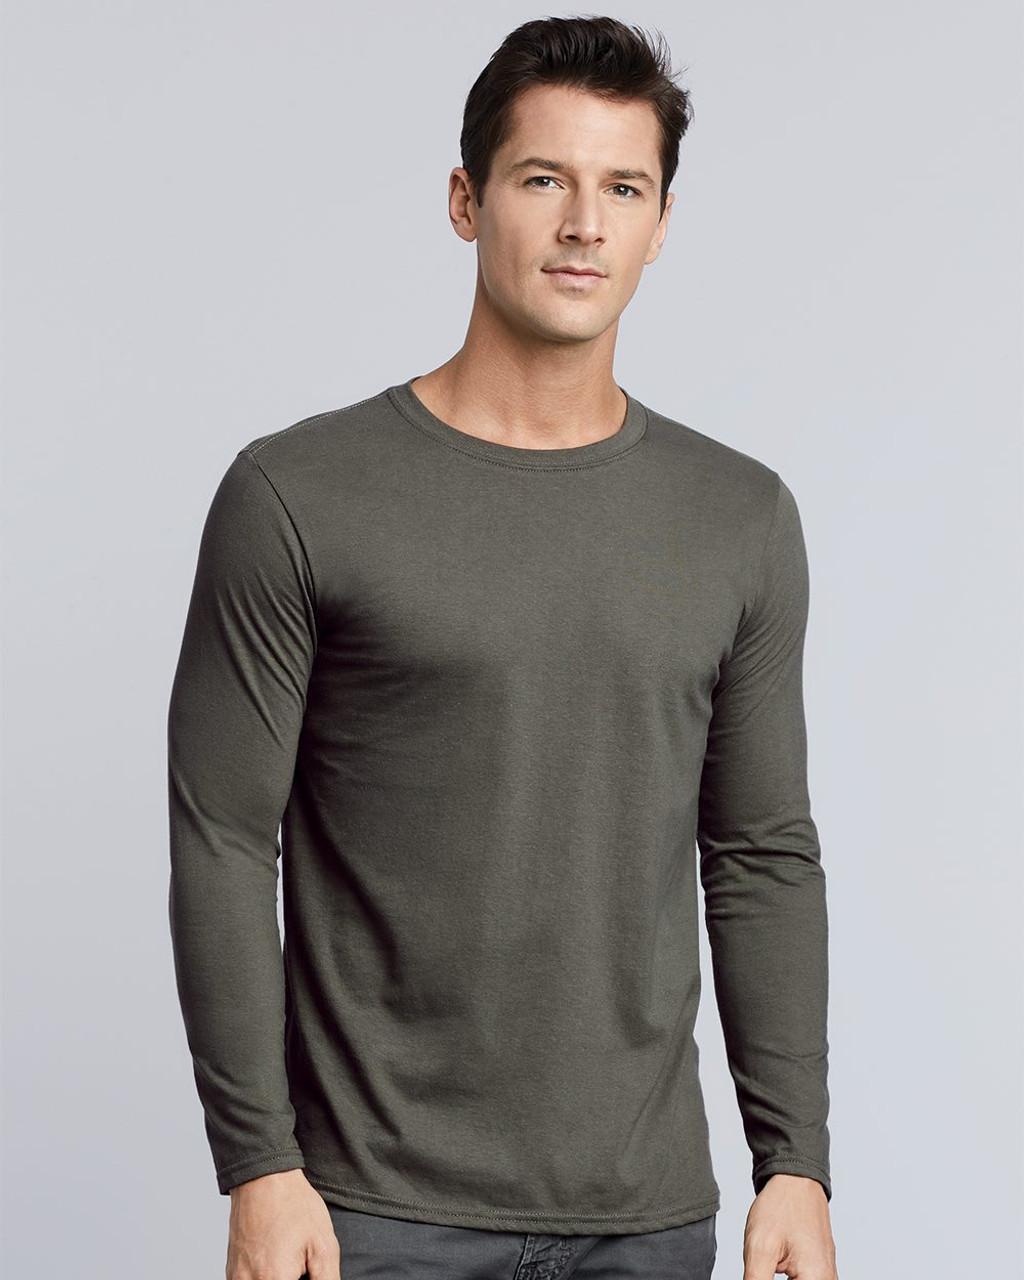 64400 Gildan Softstyle® Long Sleeve T-Shirt | T-shirt.ca